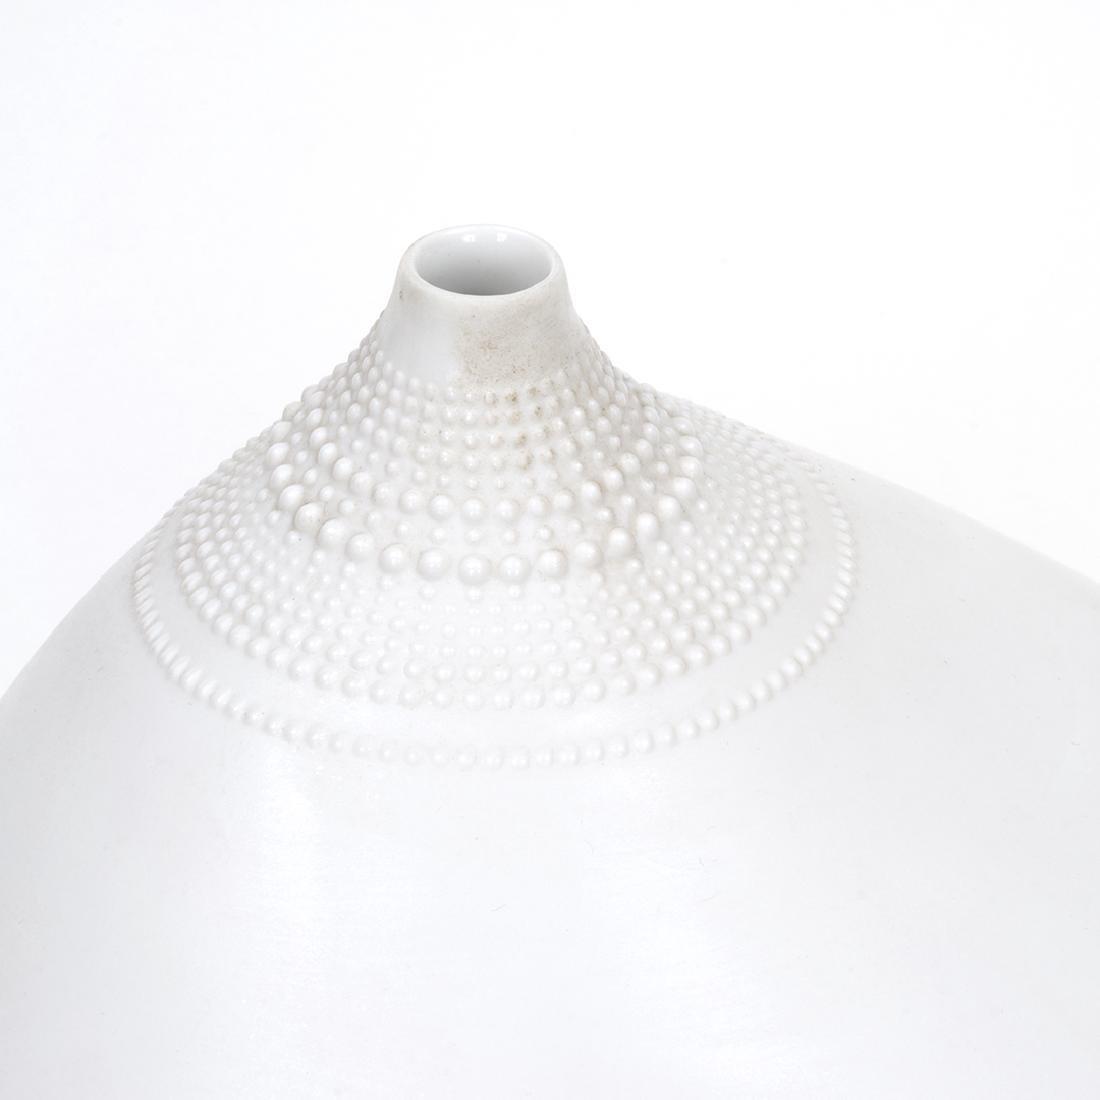 Tapio Wirkkala Pollo Vase - 4